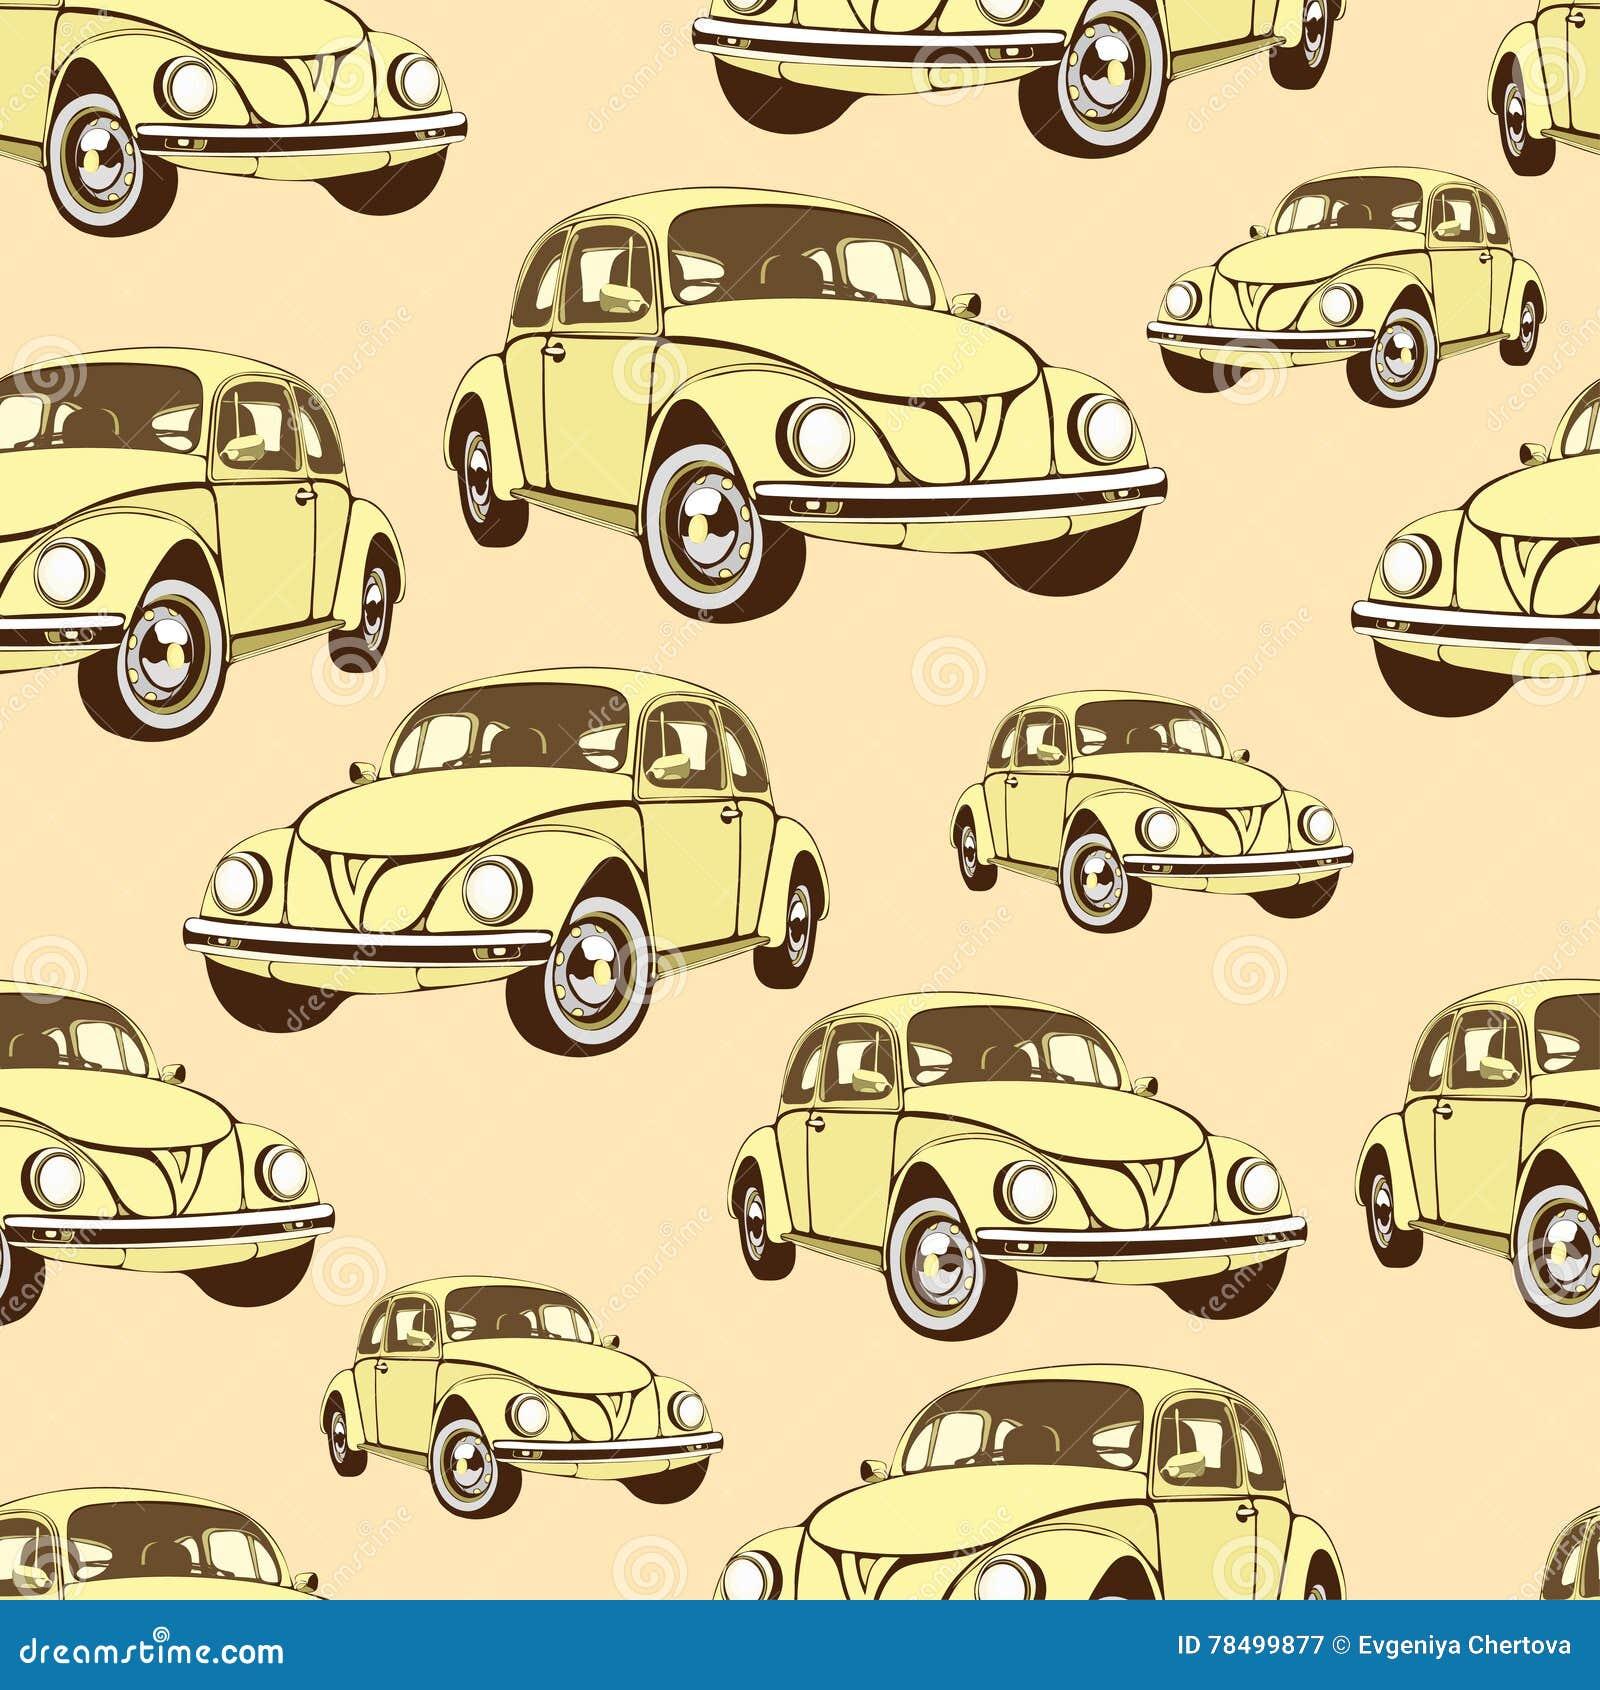 Vintage Car Seamless Pattern Retro Cartoon Background Yellow Cars